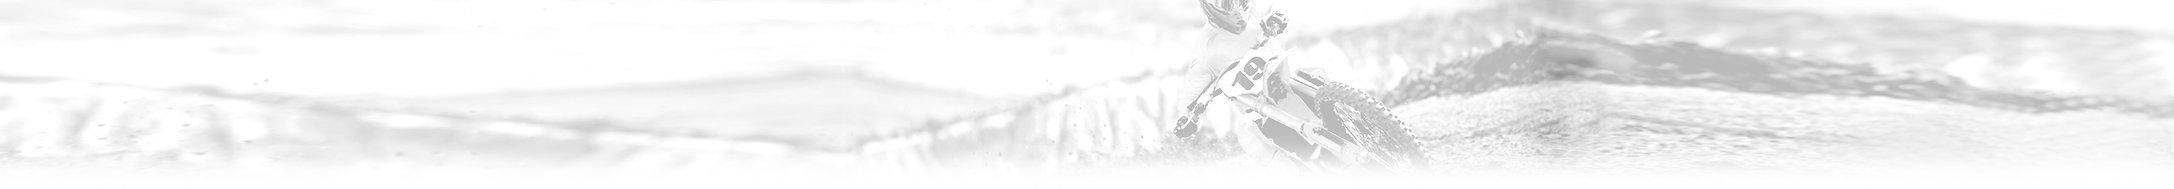 motorcycles_cat_full-width.jpg